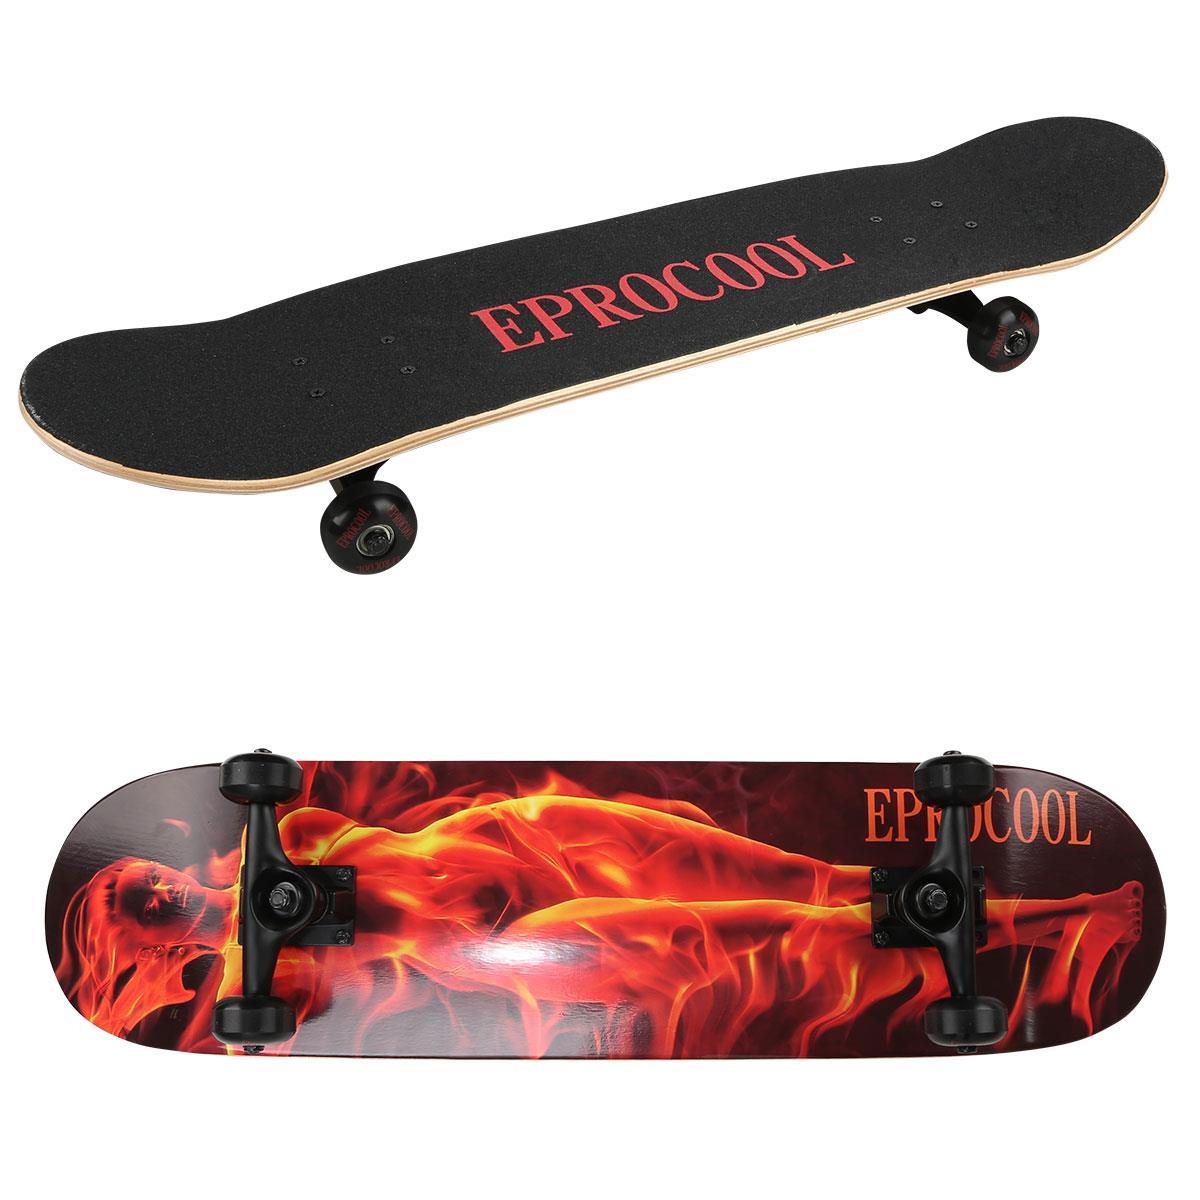 Buy Outdoor Four-Wheels Skateboard Skate Scooter Cool Street Long Board Mini Cruiser Maple Deck